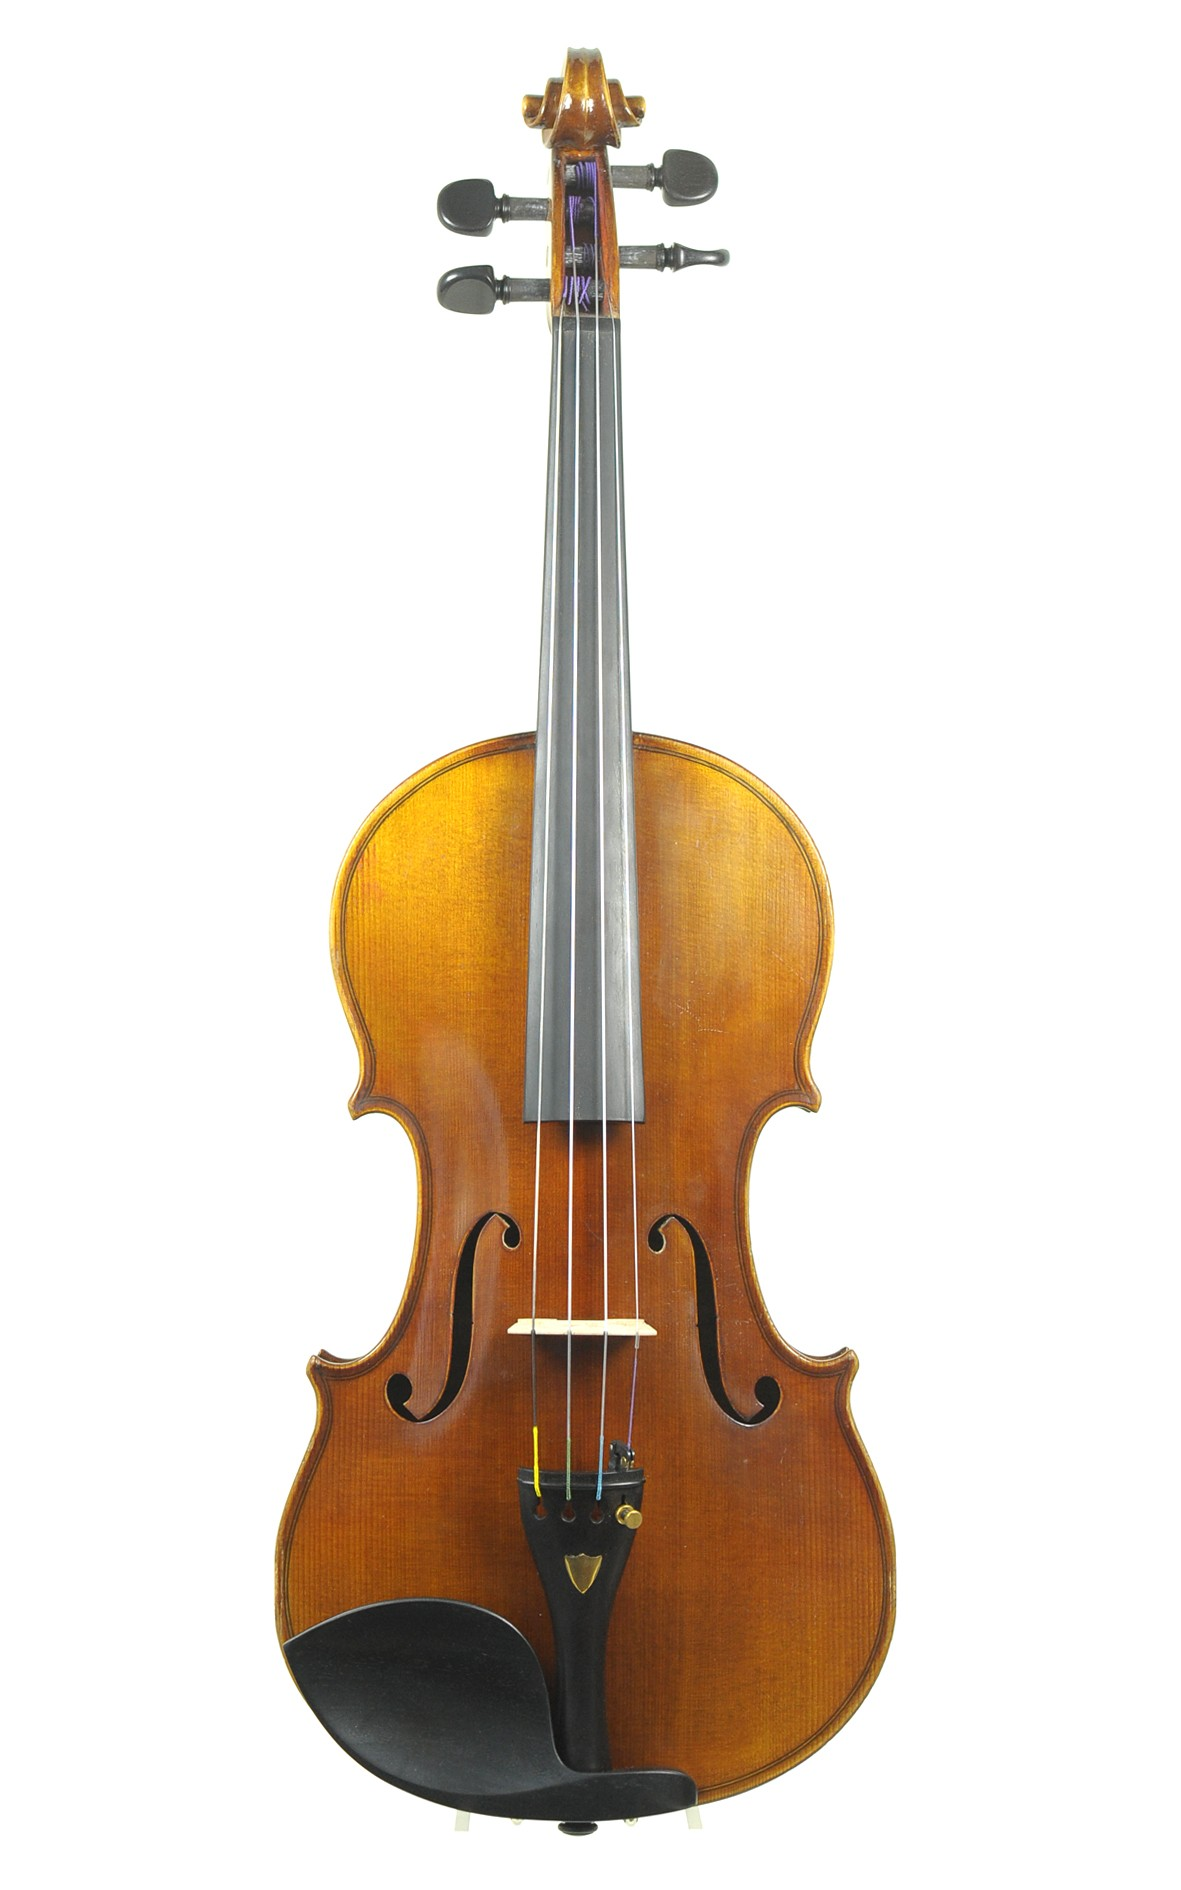 Markneukirchen violin, approx. 1980